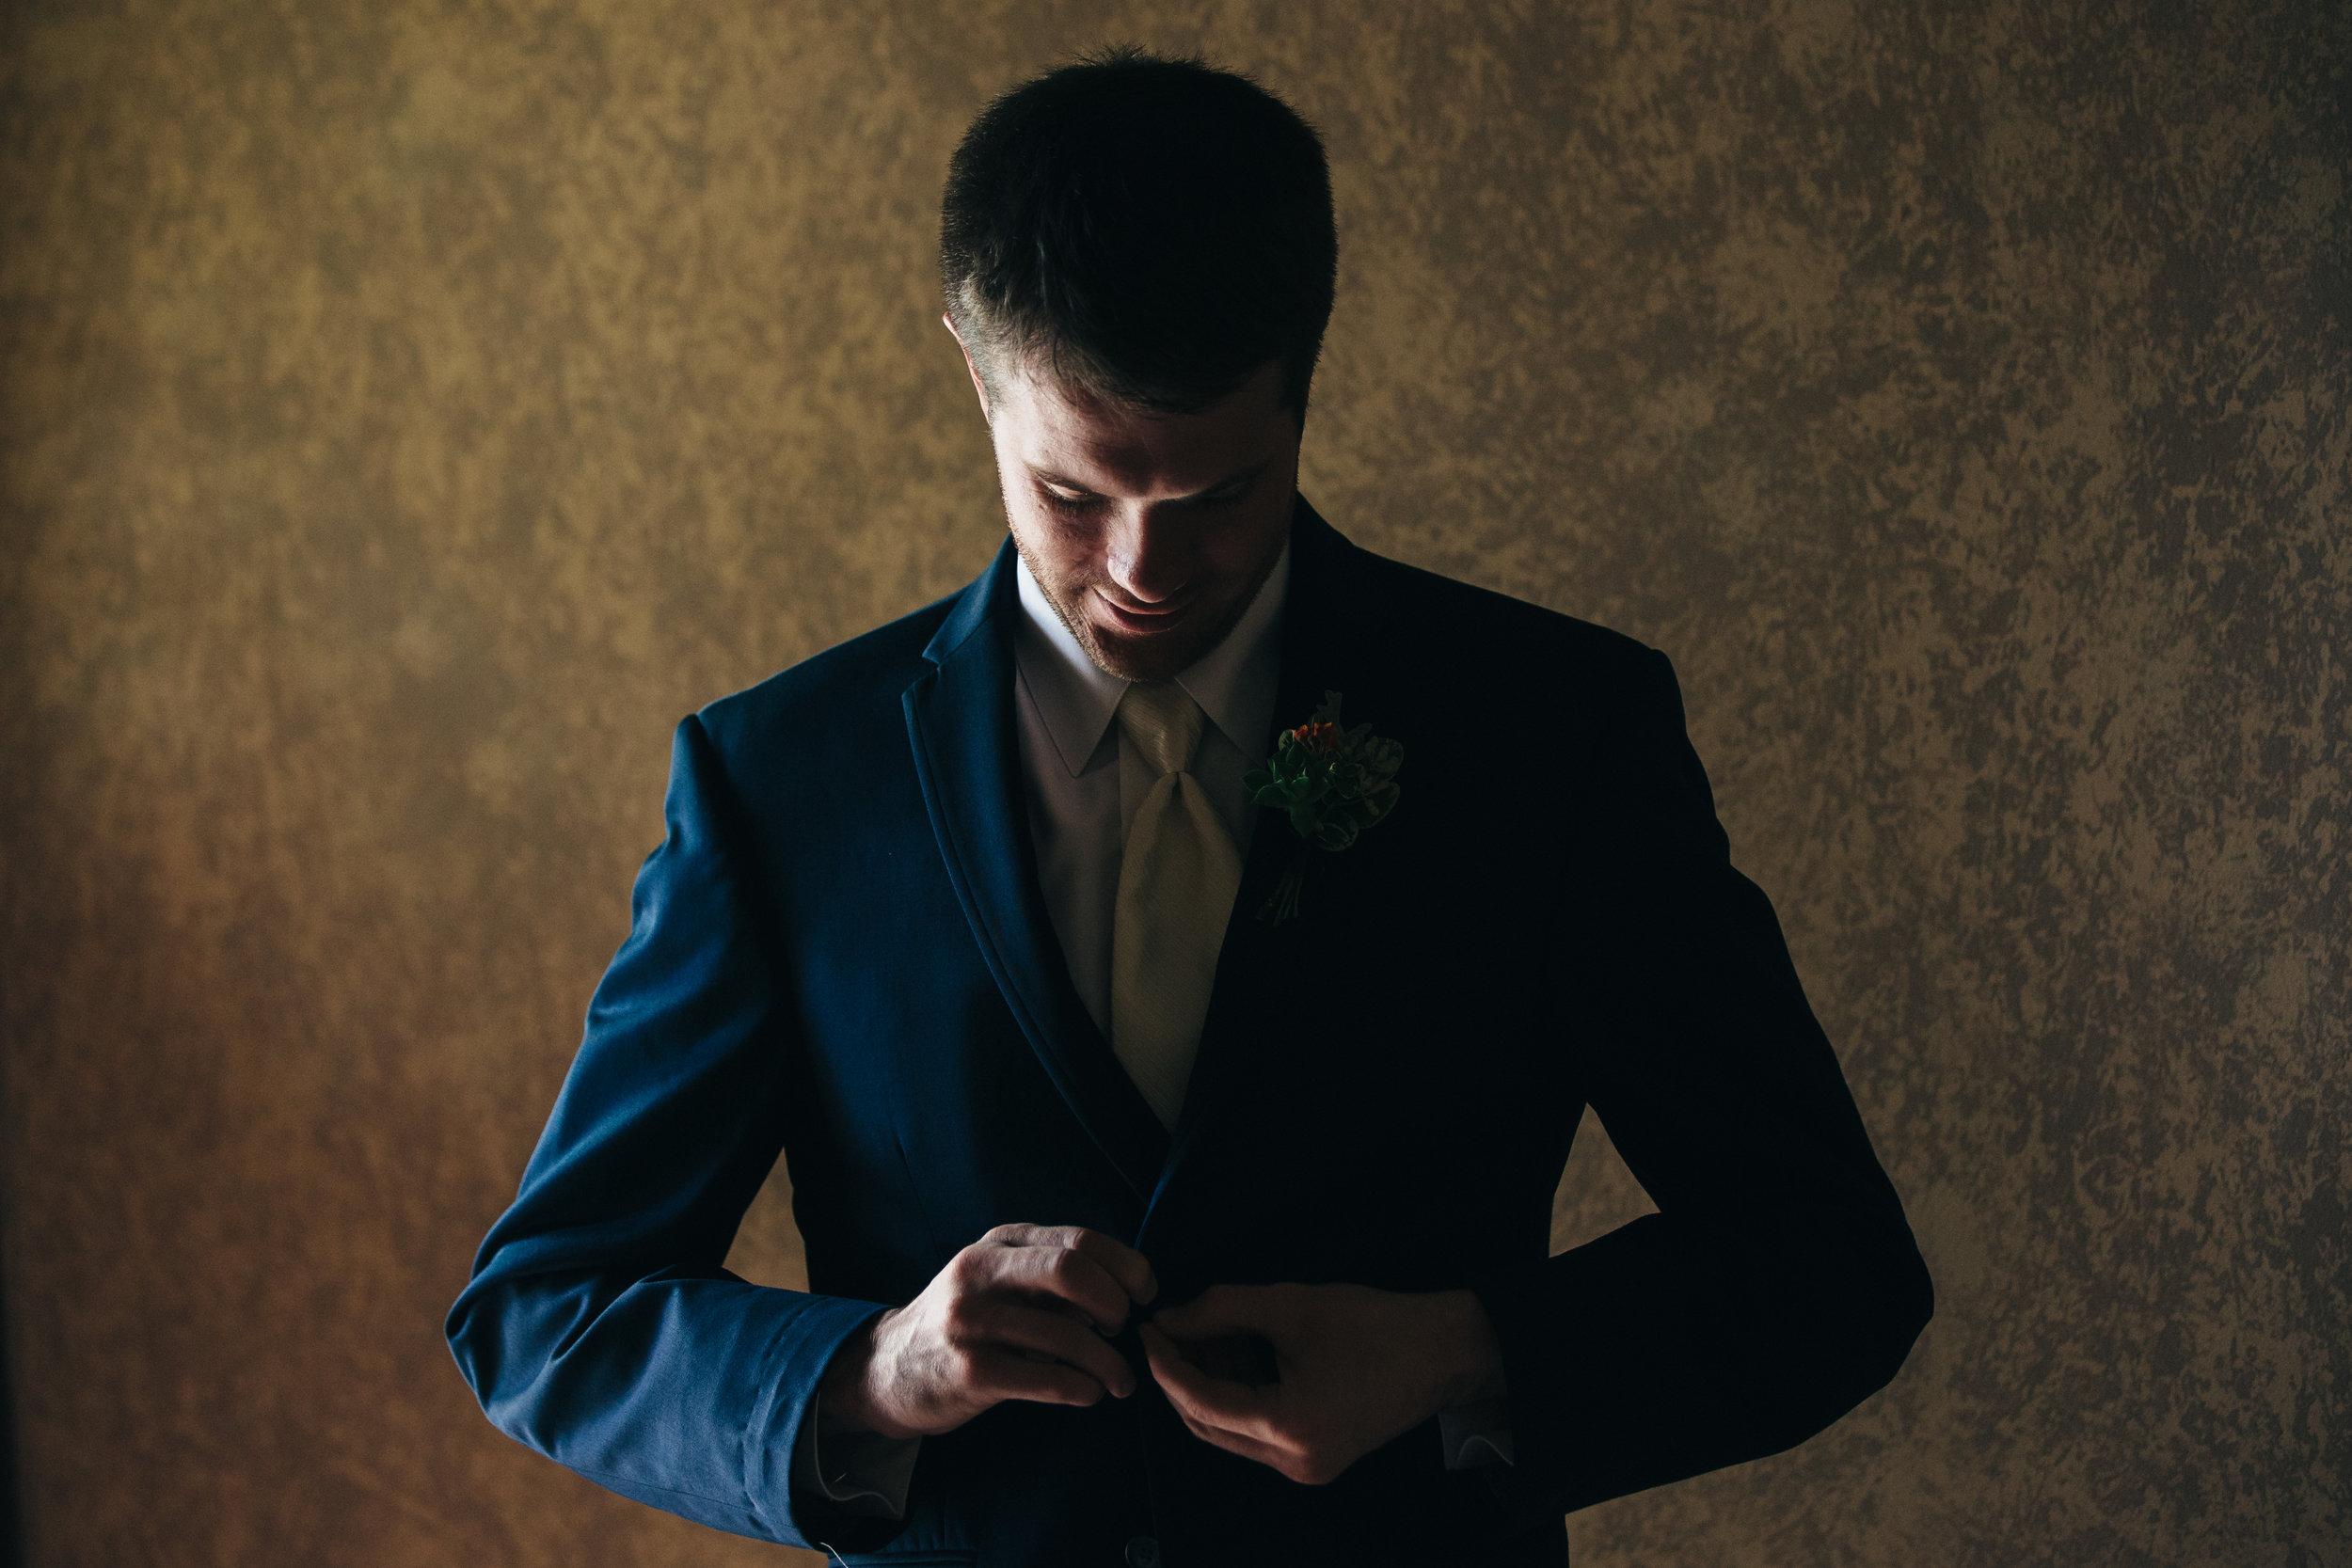 Groom getting ready for wedding day